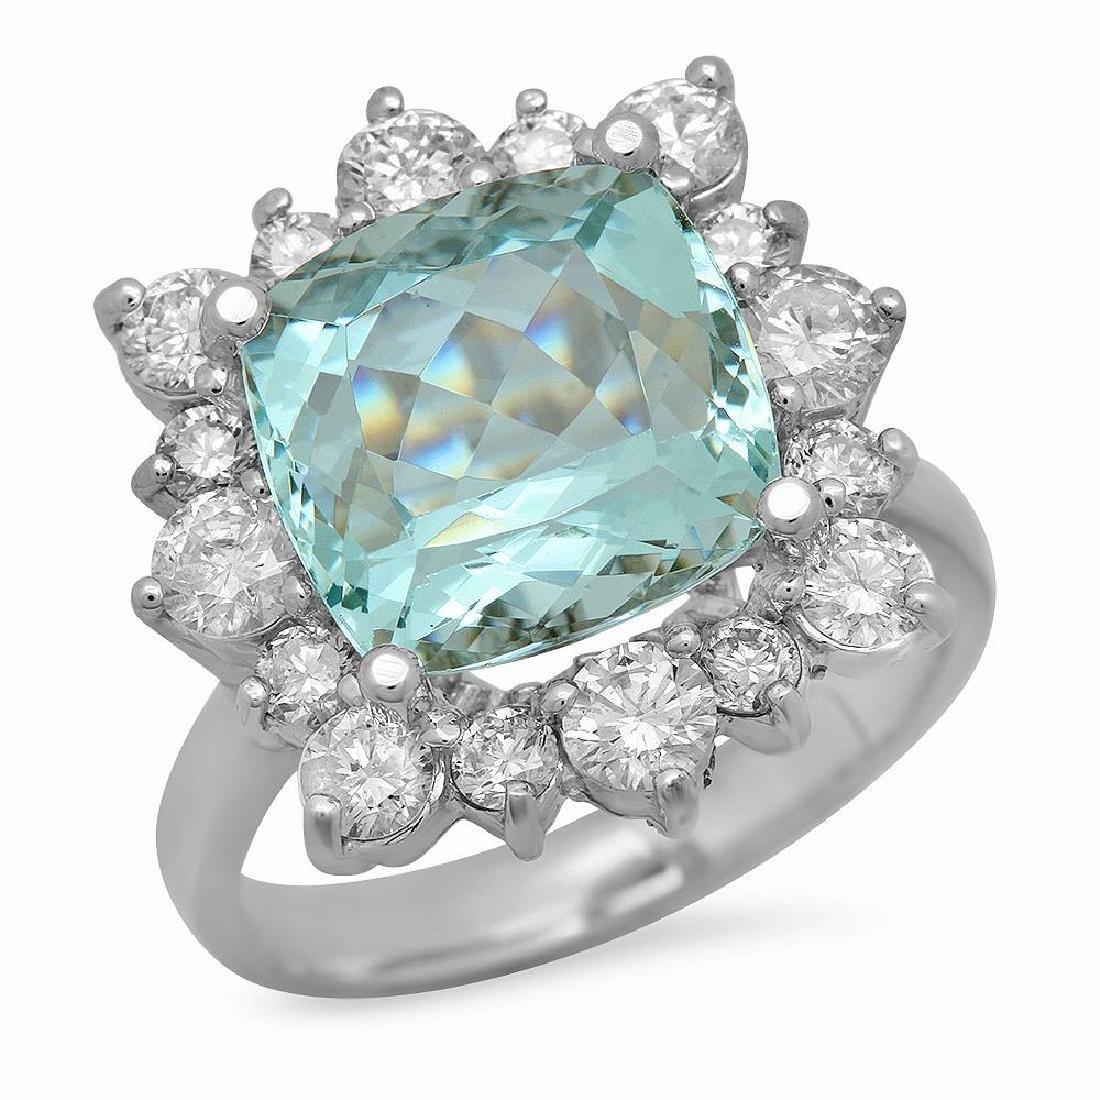 14K Gold 5.79ct Aquamarine 1.44ct Diamond Ring